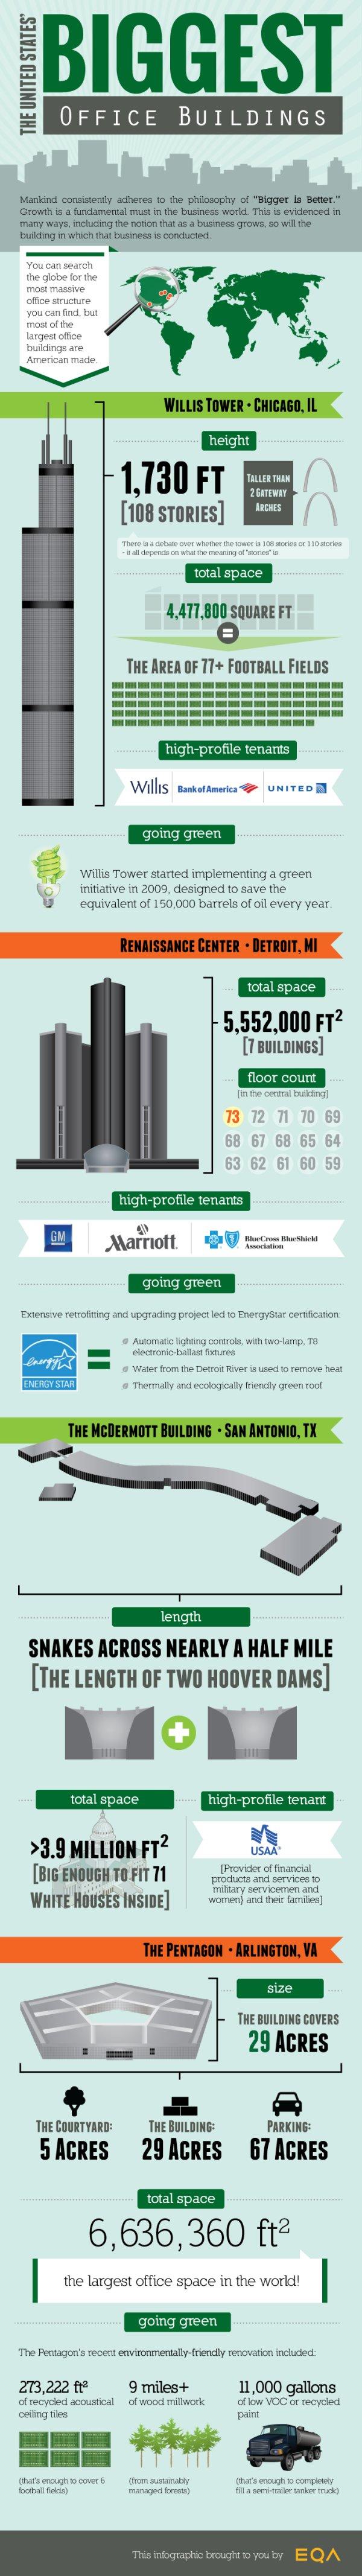 Biggest-Office-Buildings